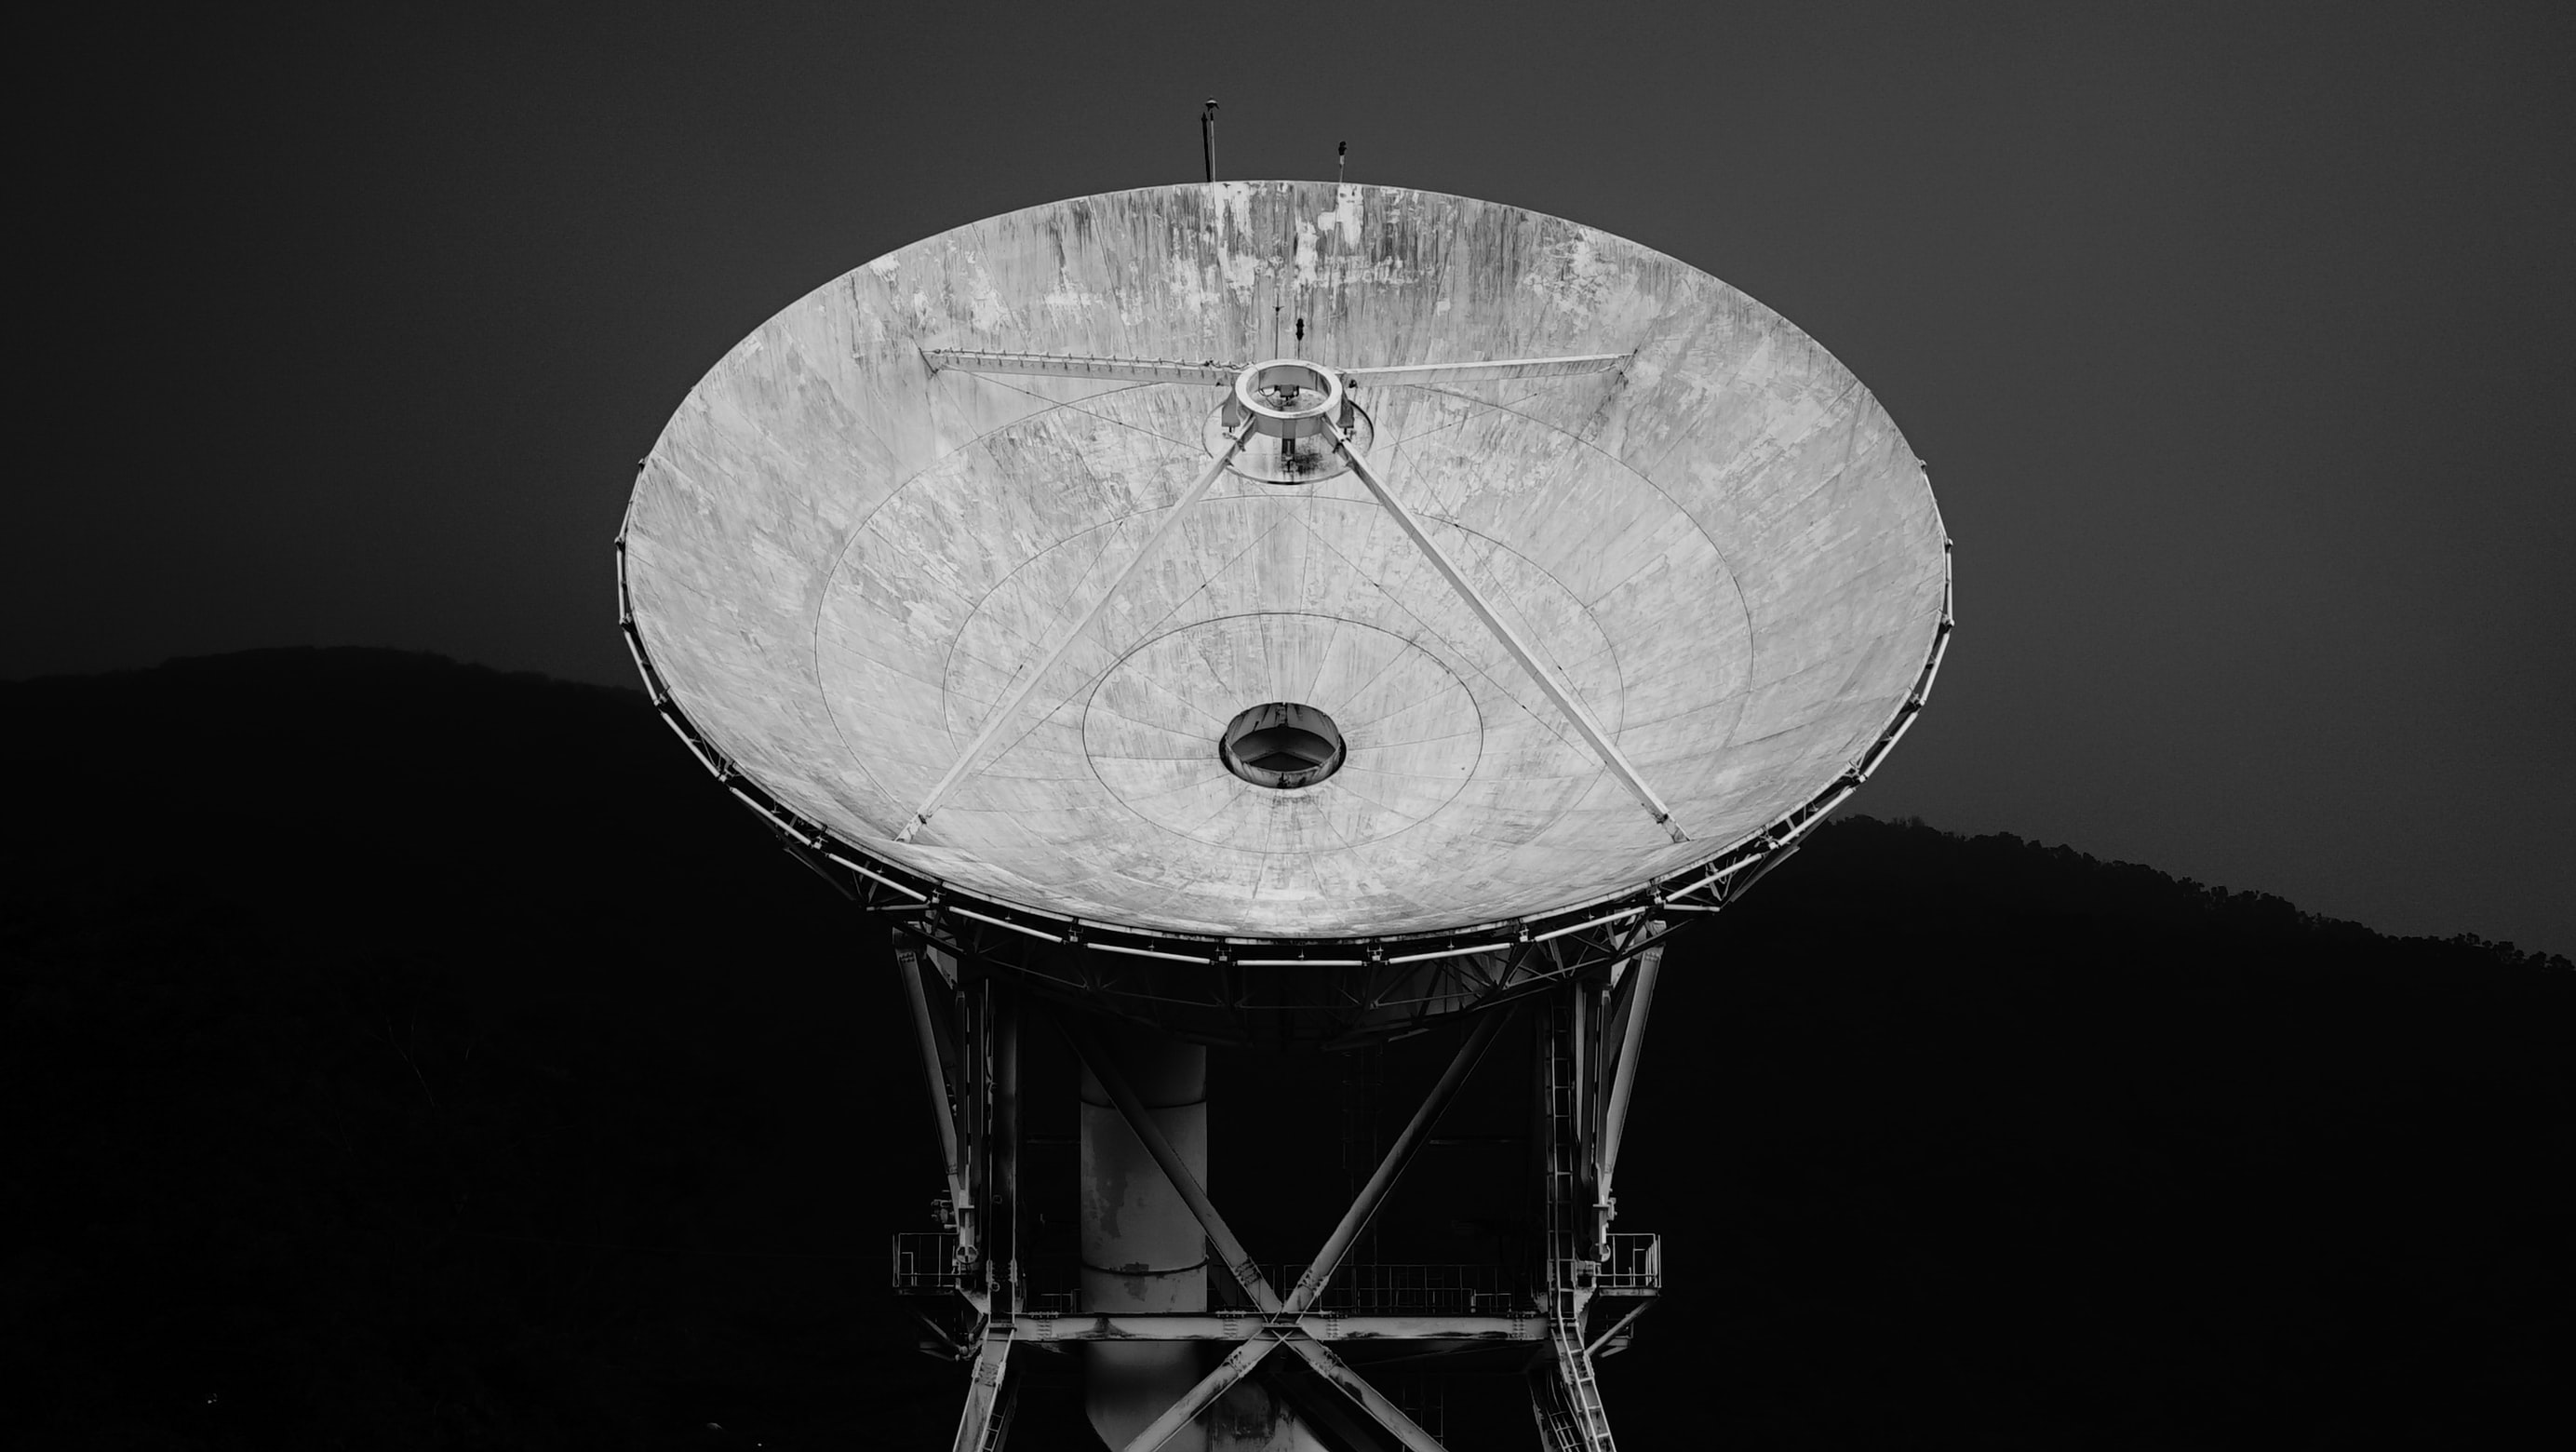 A black-and-white shot of a dish radio telescope